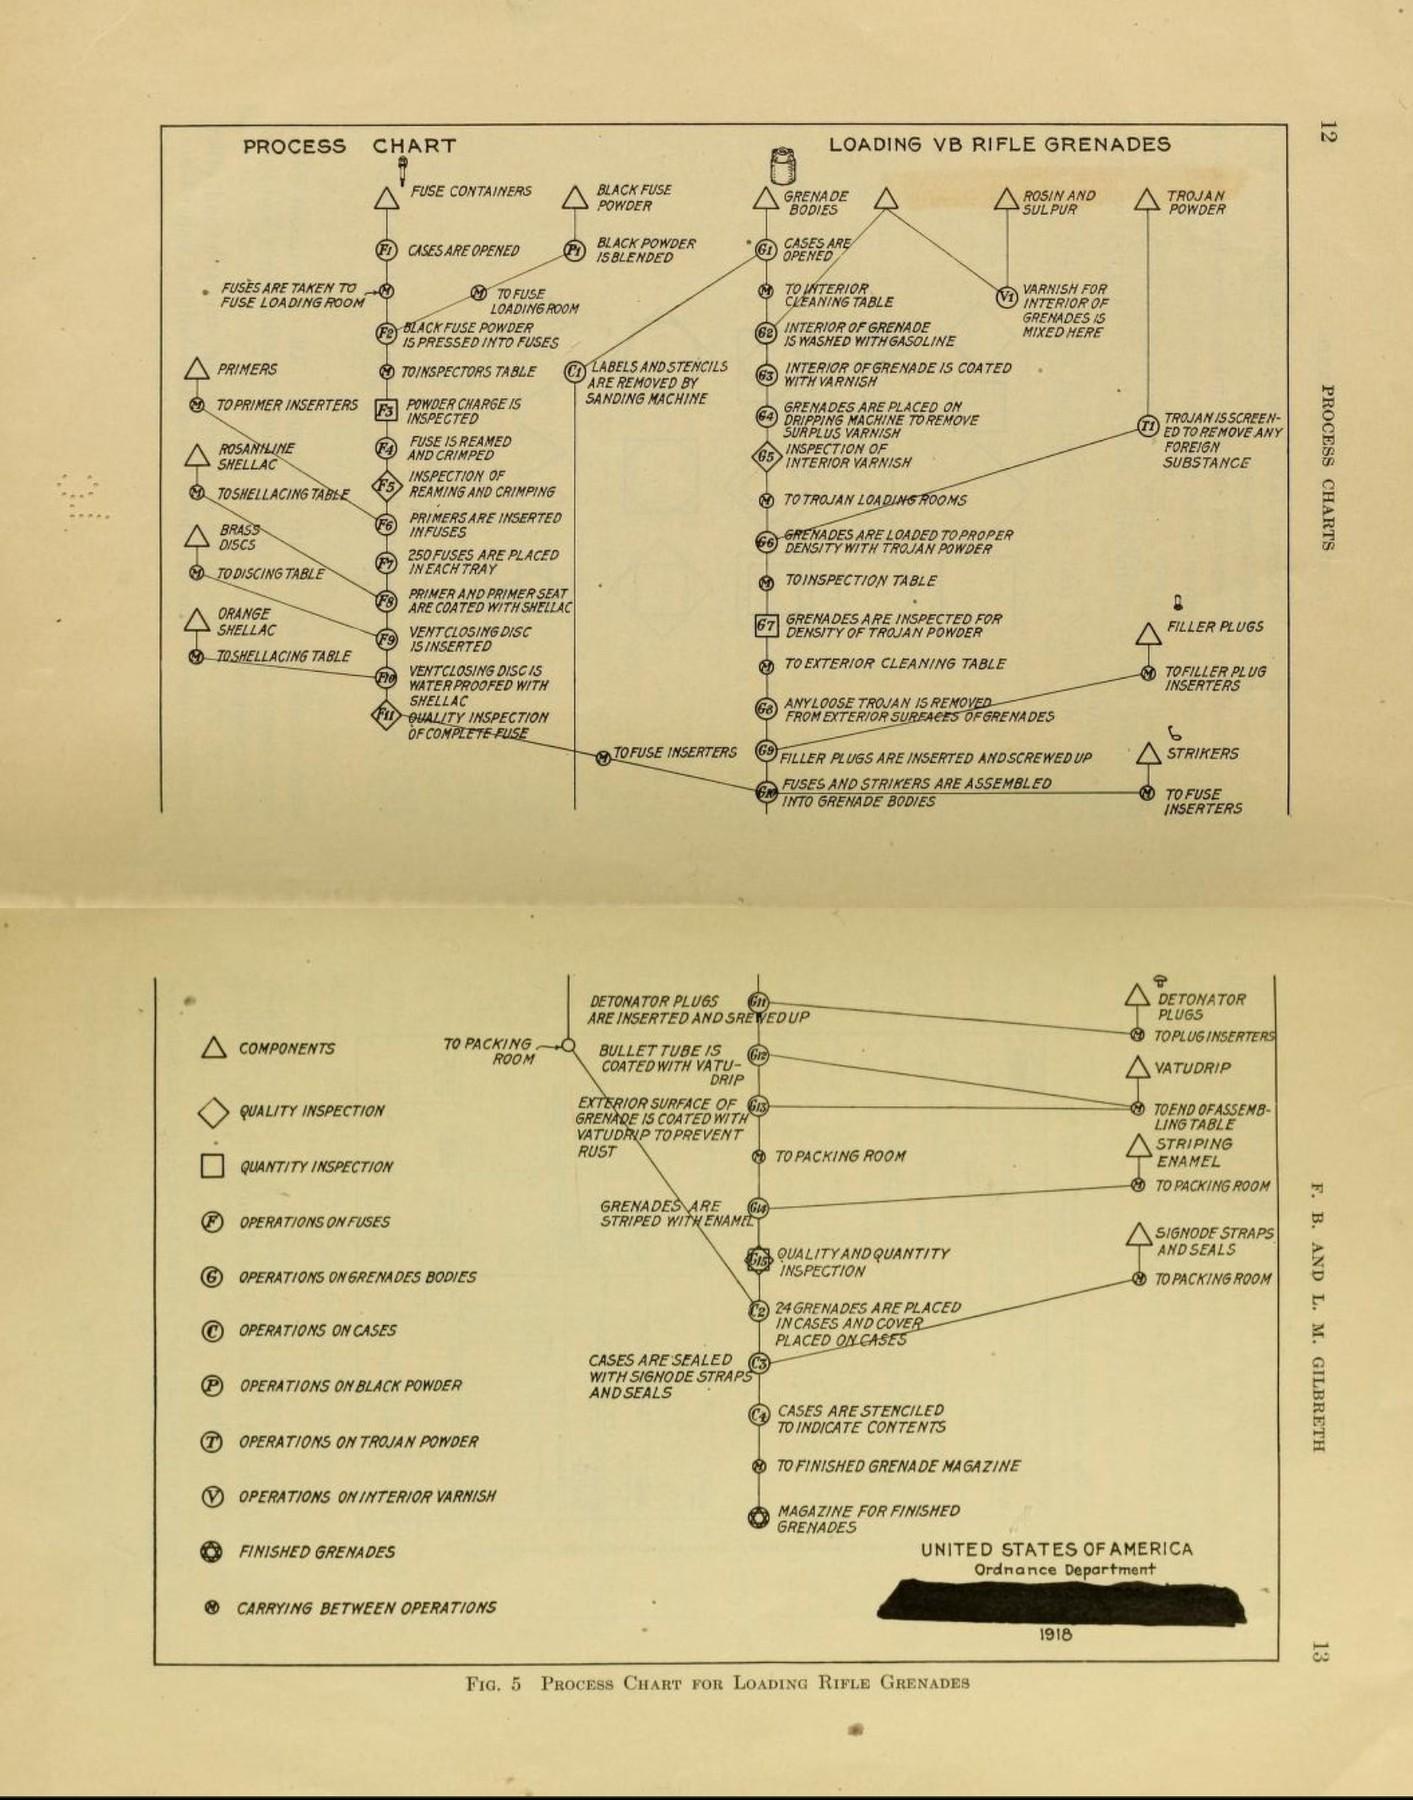 Gilbreth process chart